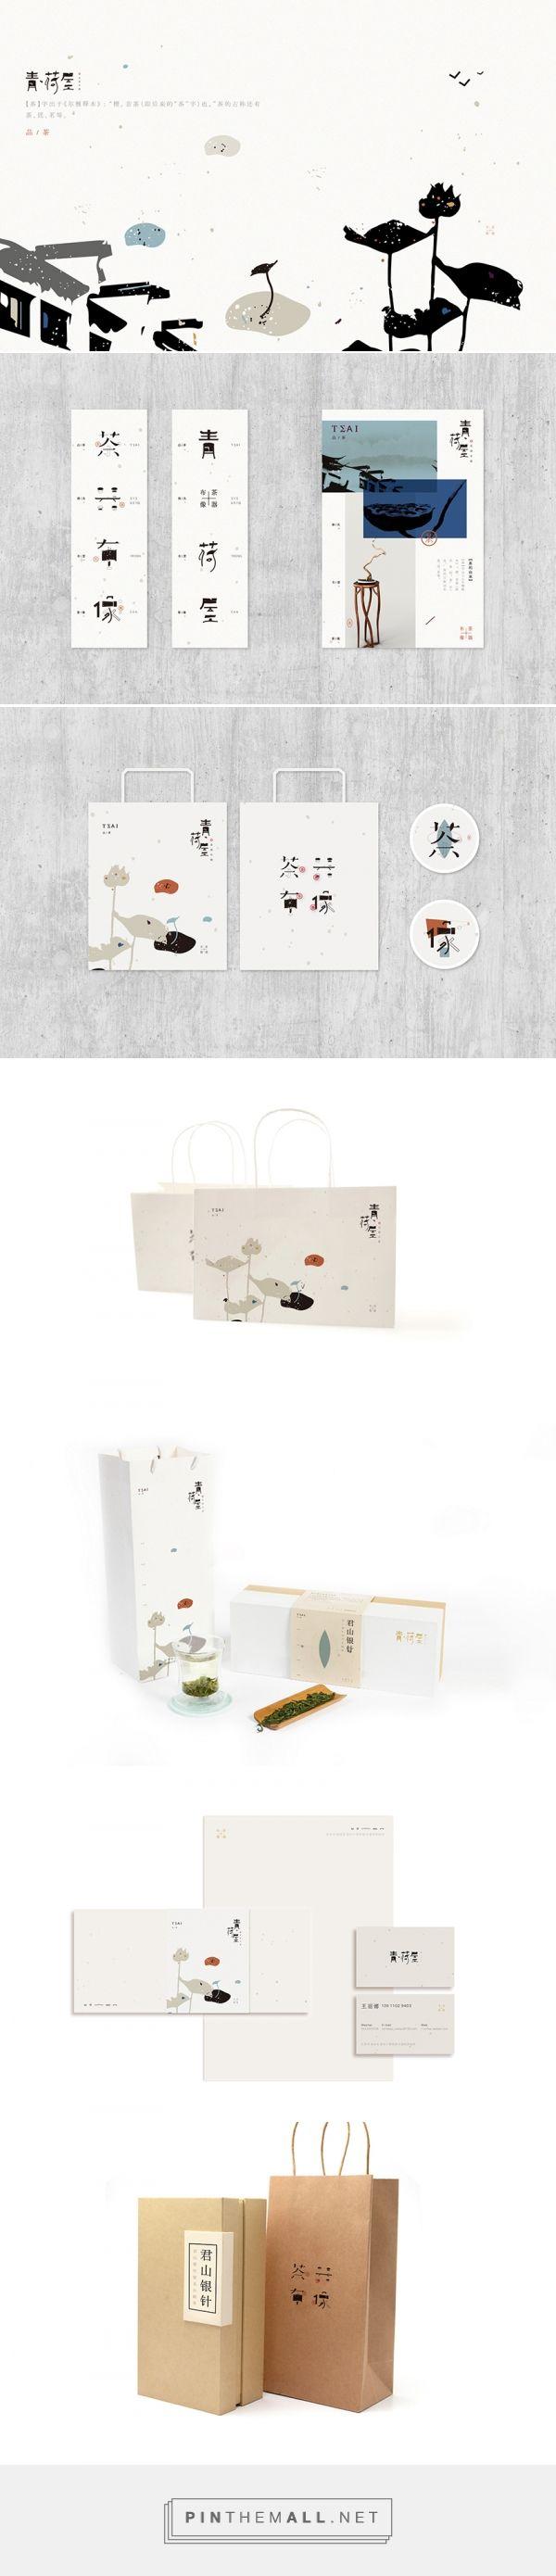 青荷屋品牌视觉设计 on Behance by 龙 谷 curated by Packaging Diva PD. Branding, packaging…